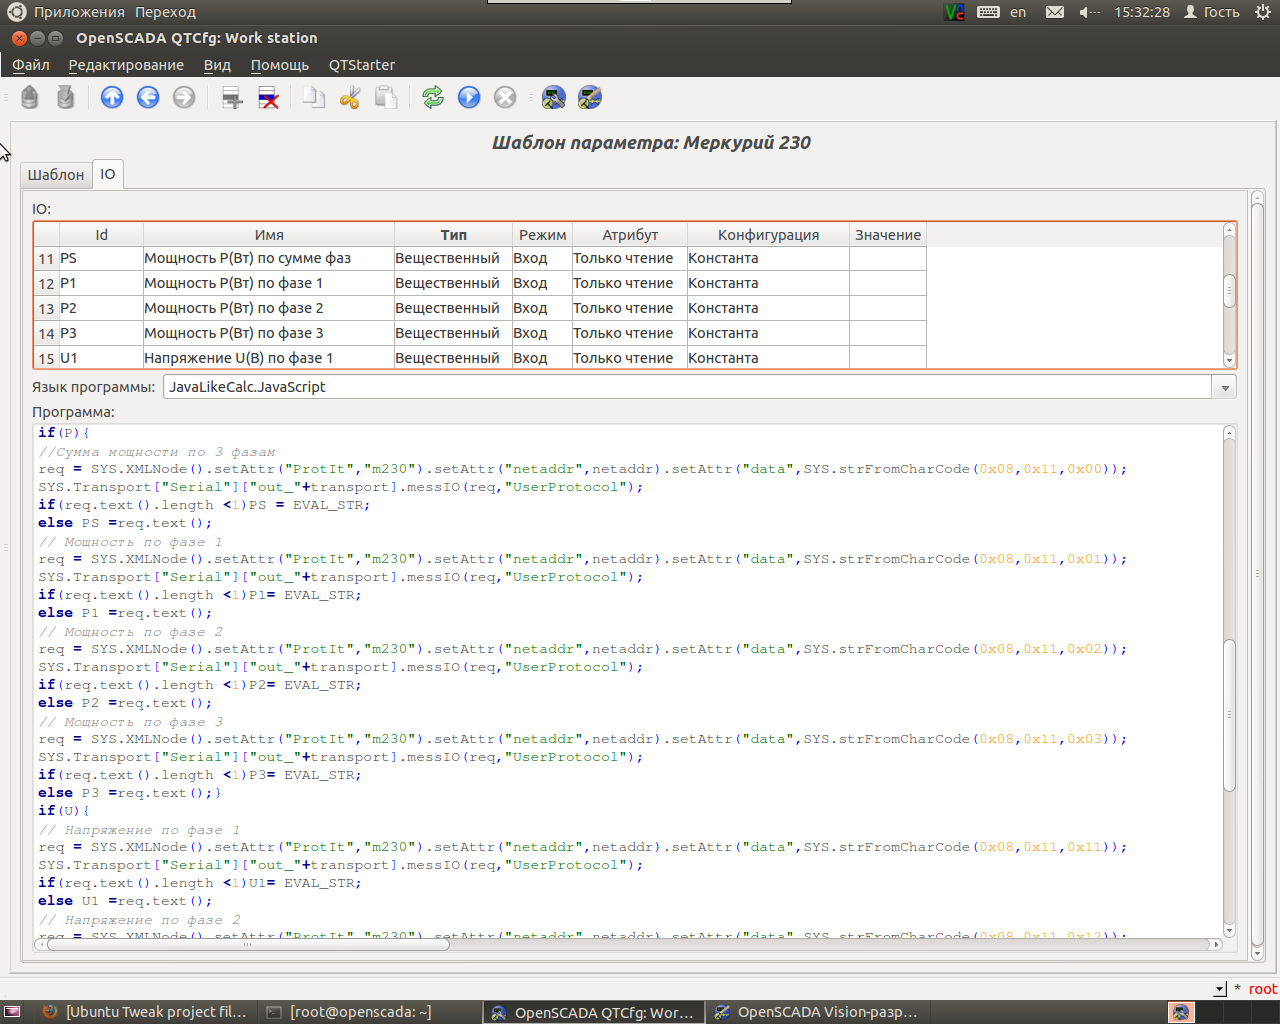 Пишем протоколы счетчиков Меркурий 230 и Меркурий 200 для OpenSCADA - 15